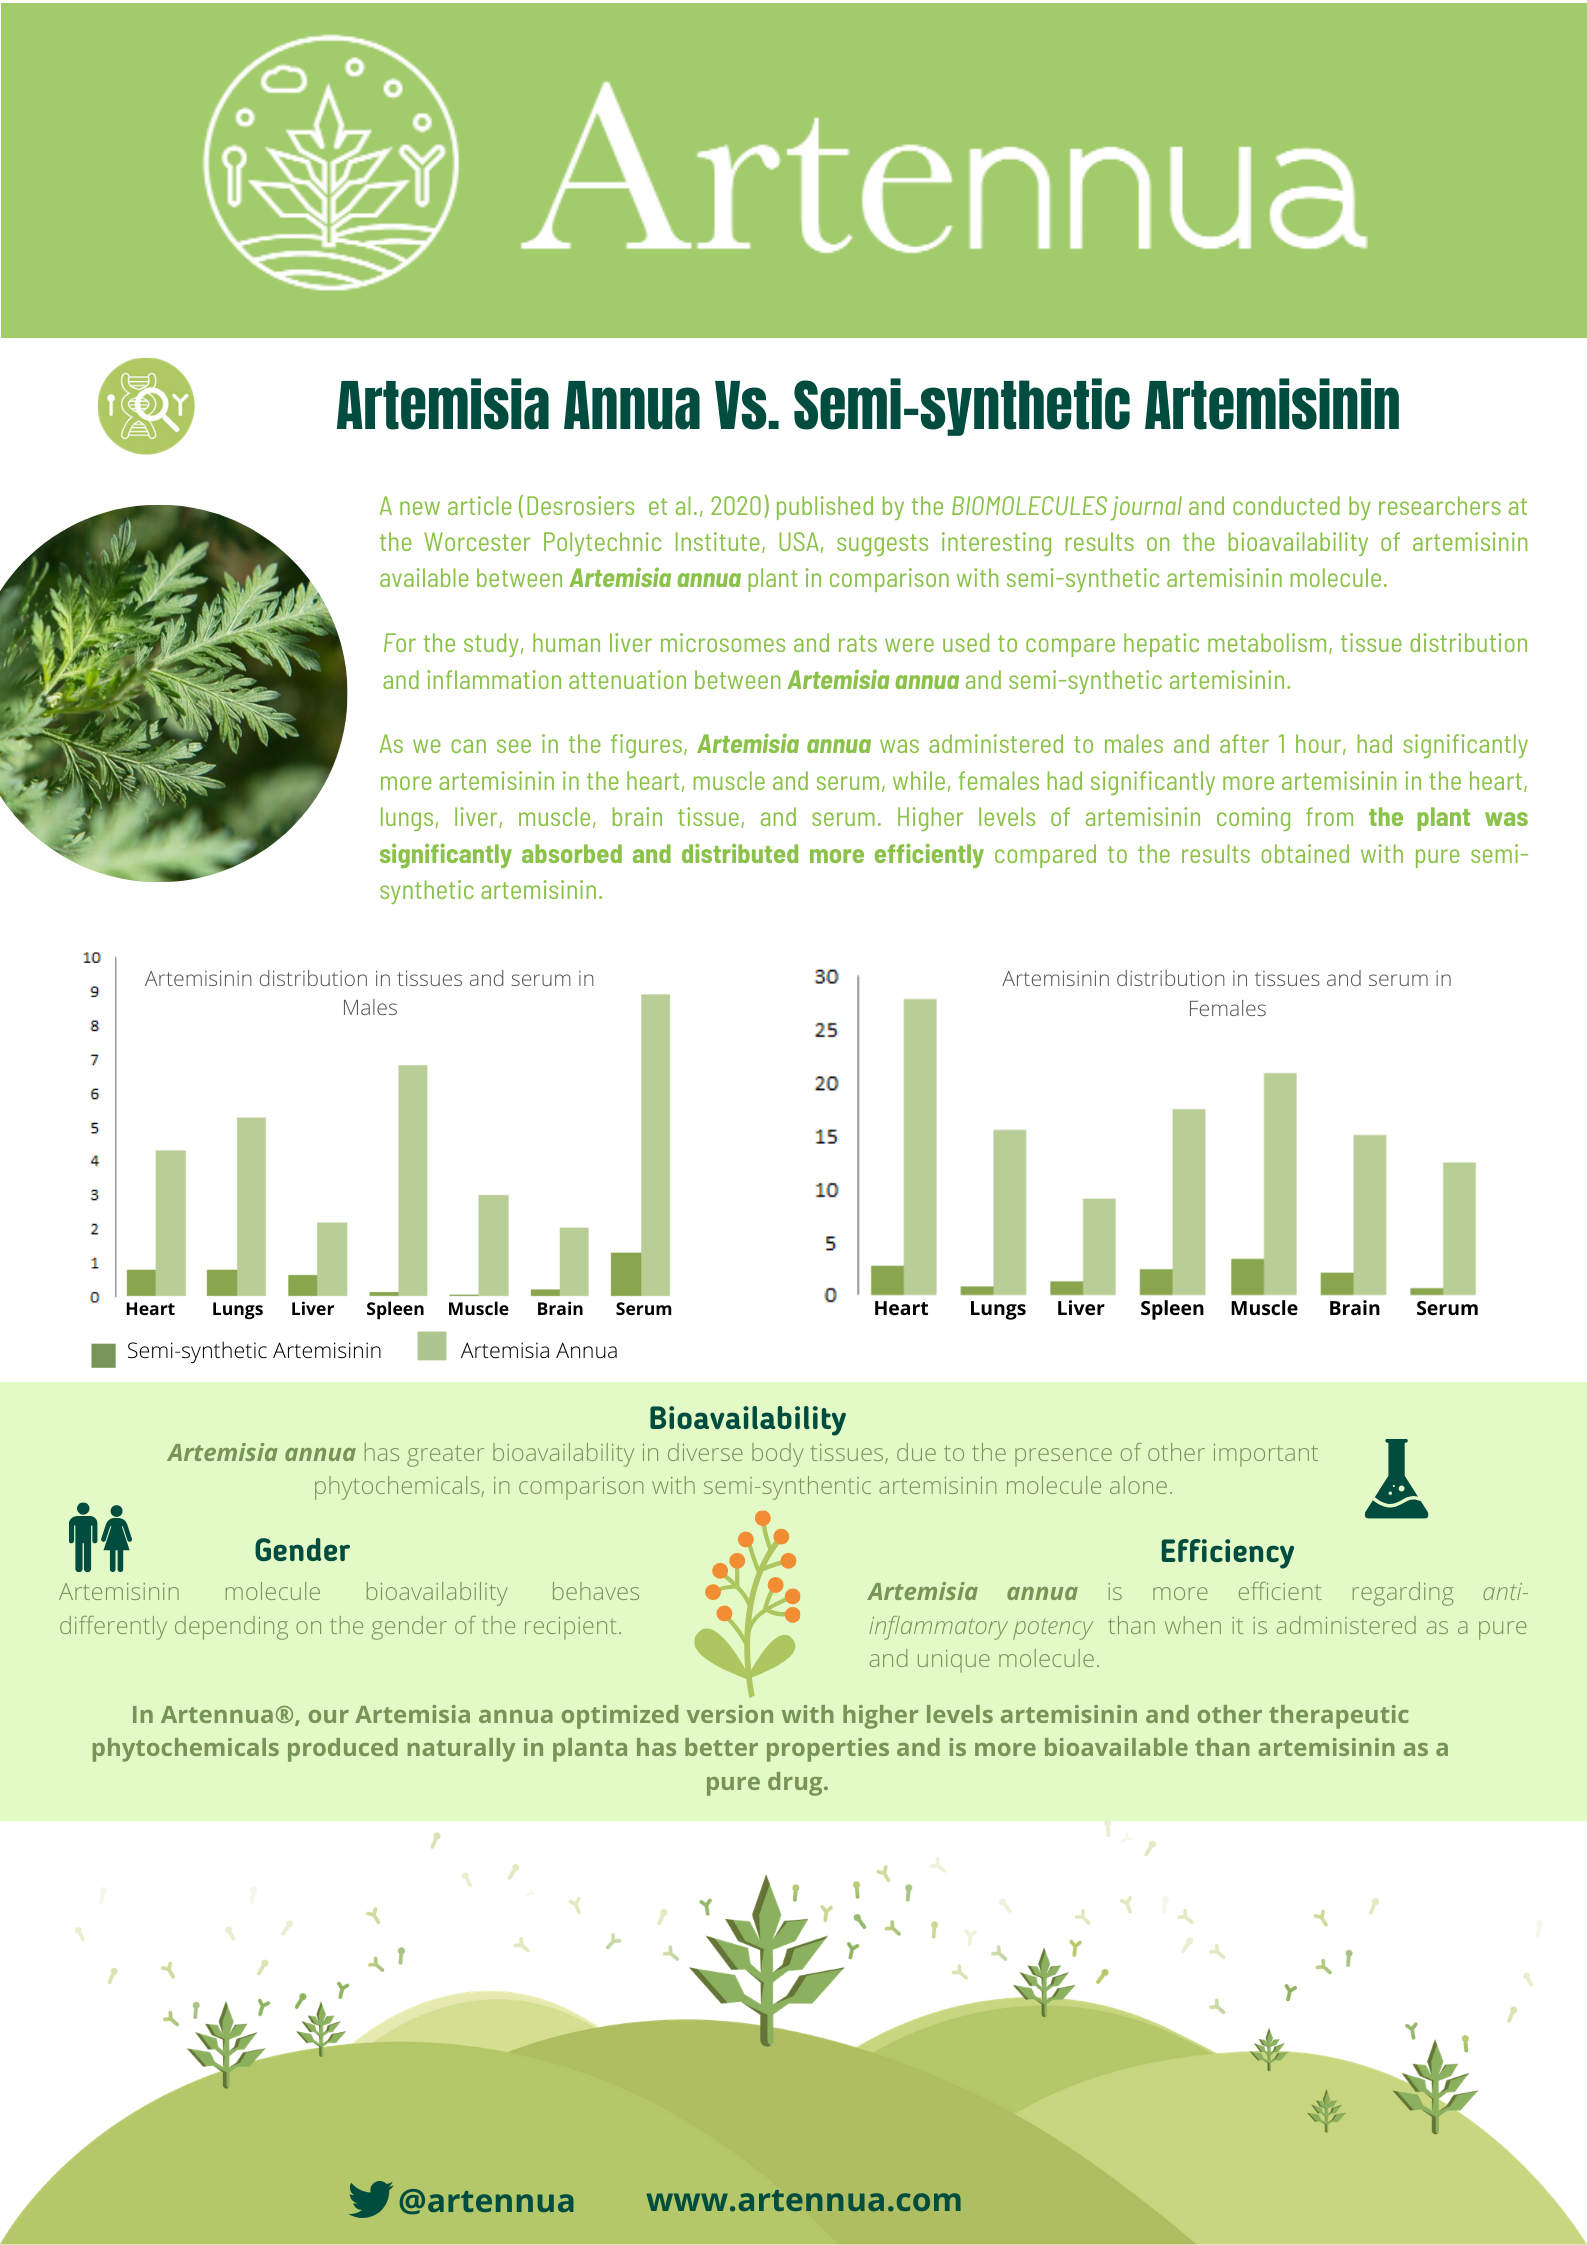 Infographic Artemisia Annua vs. Semi-Synthetic Artemisinin